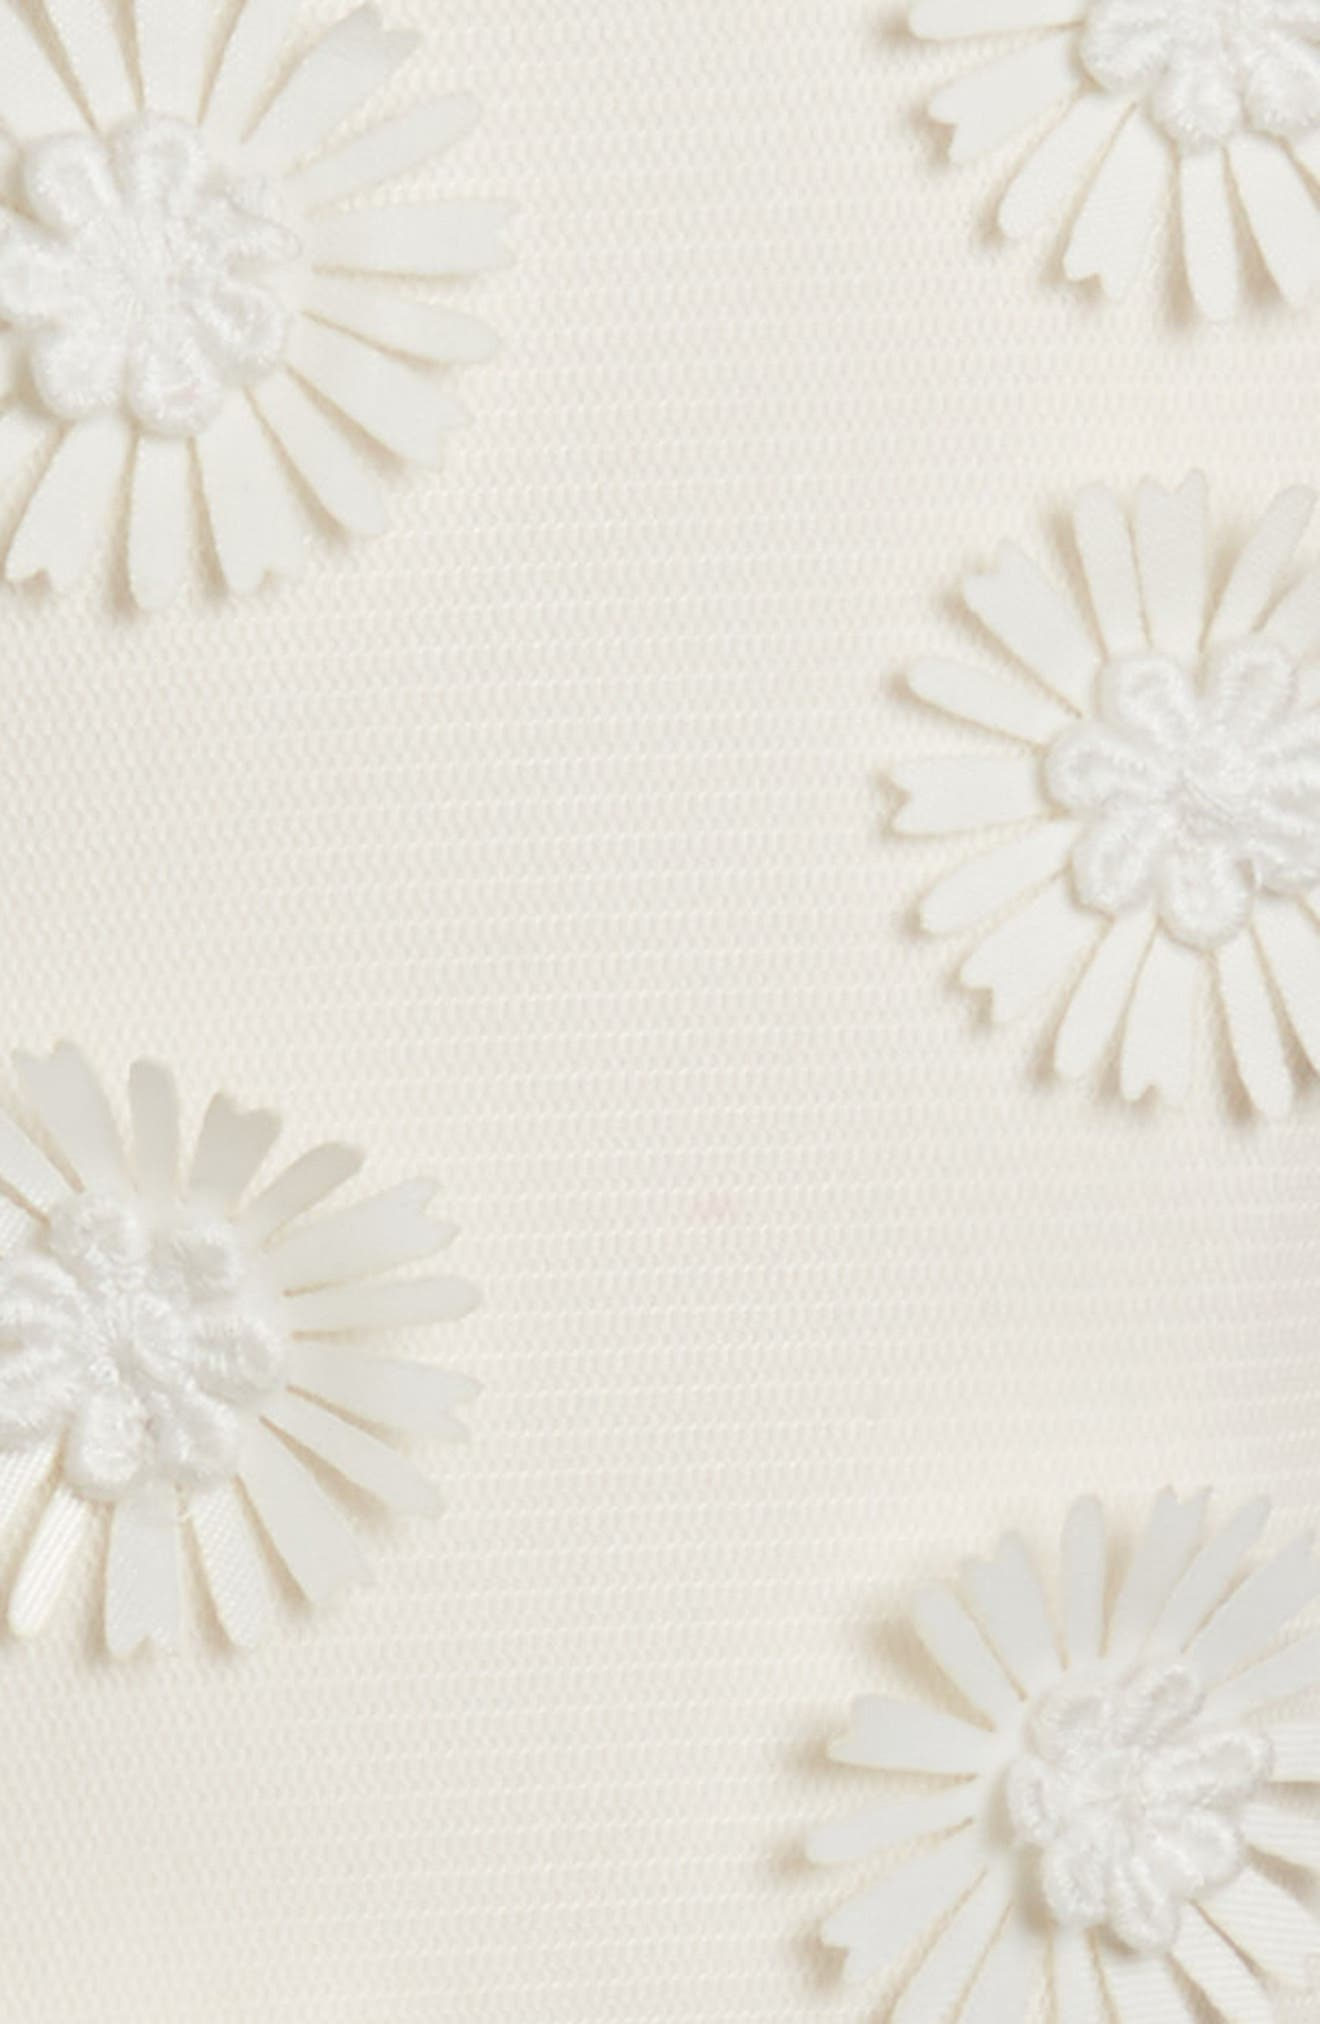 Daisy Pettidress,                             Alternate thumbnail 2, color,                             White